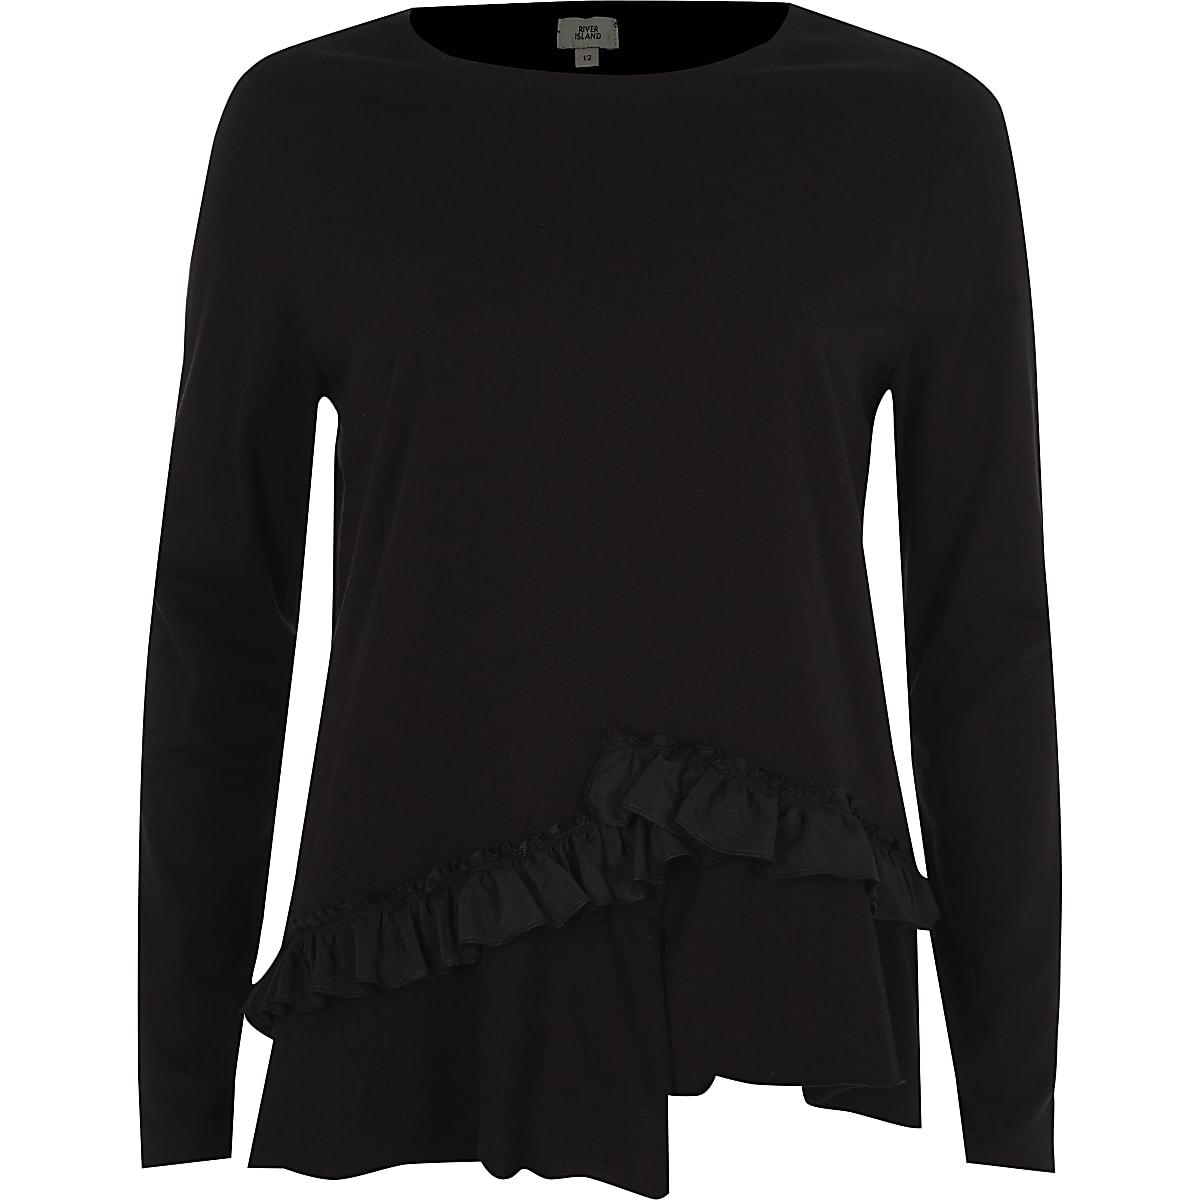 Black asymmetric frill long sleeve T-shirt